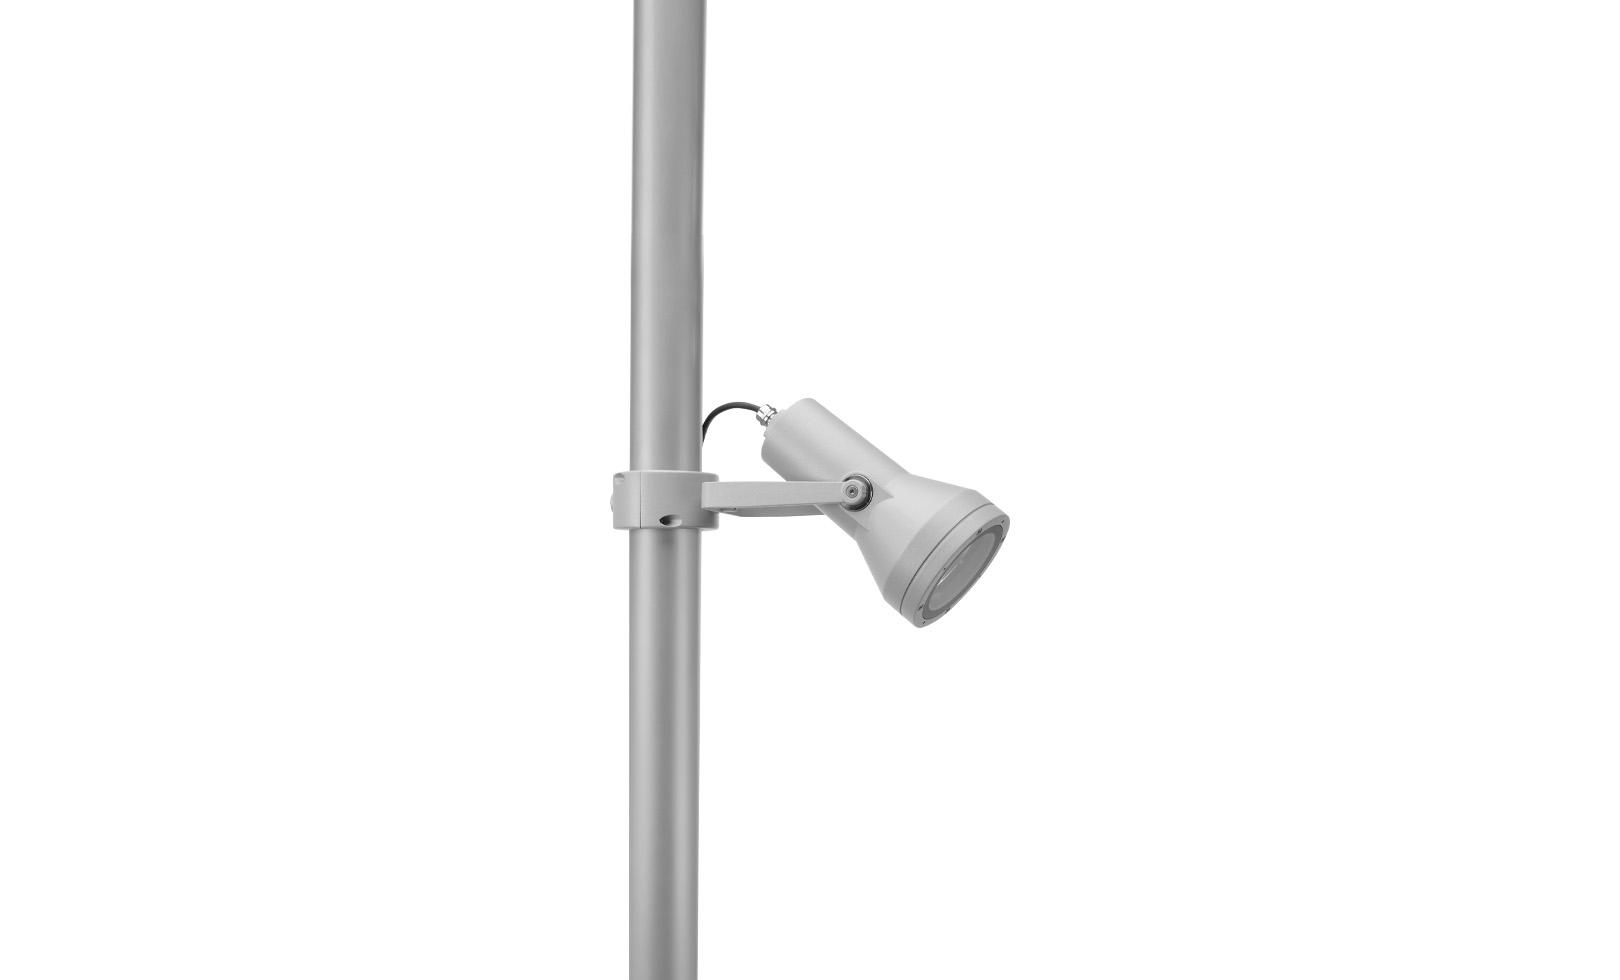 805002-805006 FLASH POLE MEDIUM COB LED 18W 2